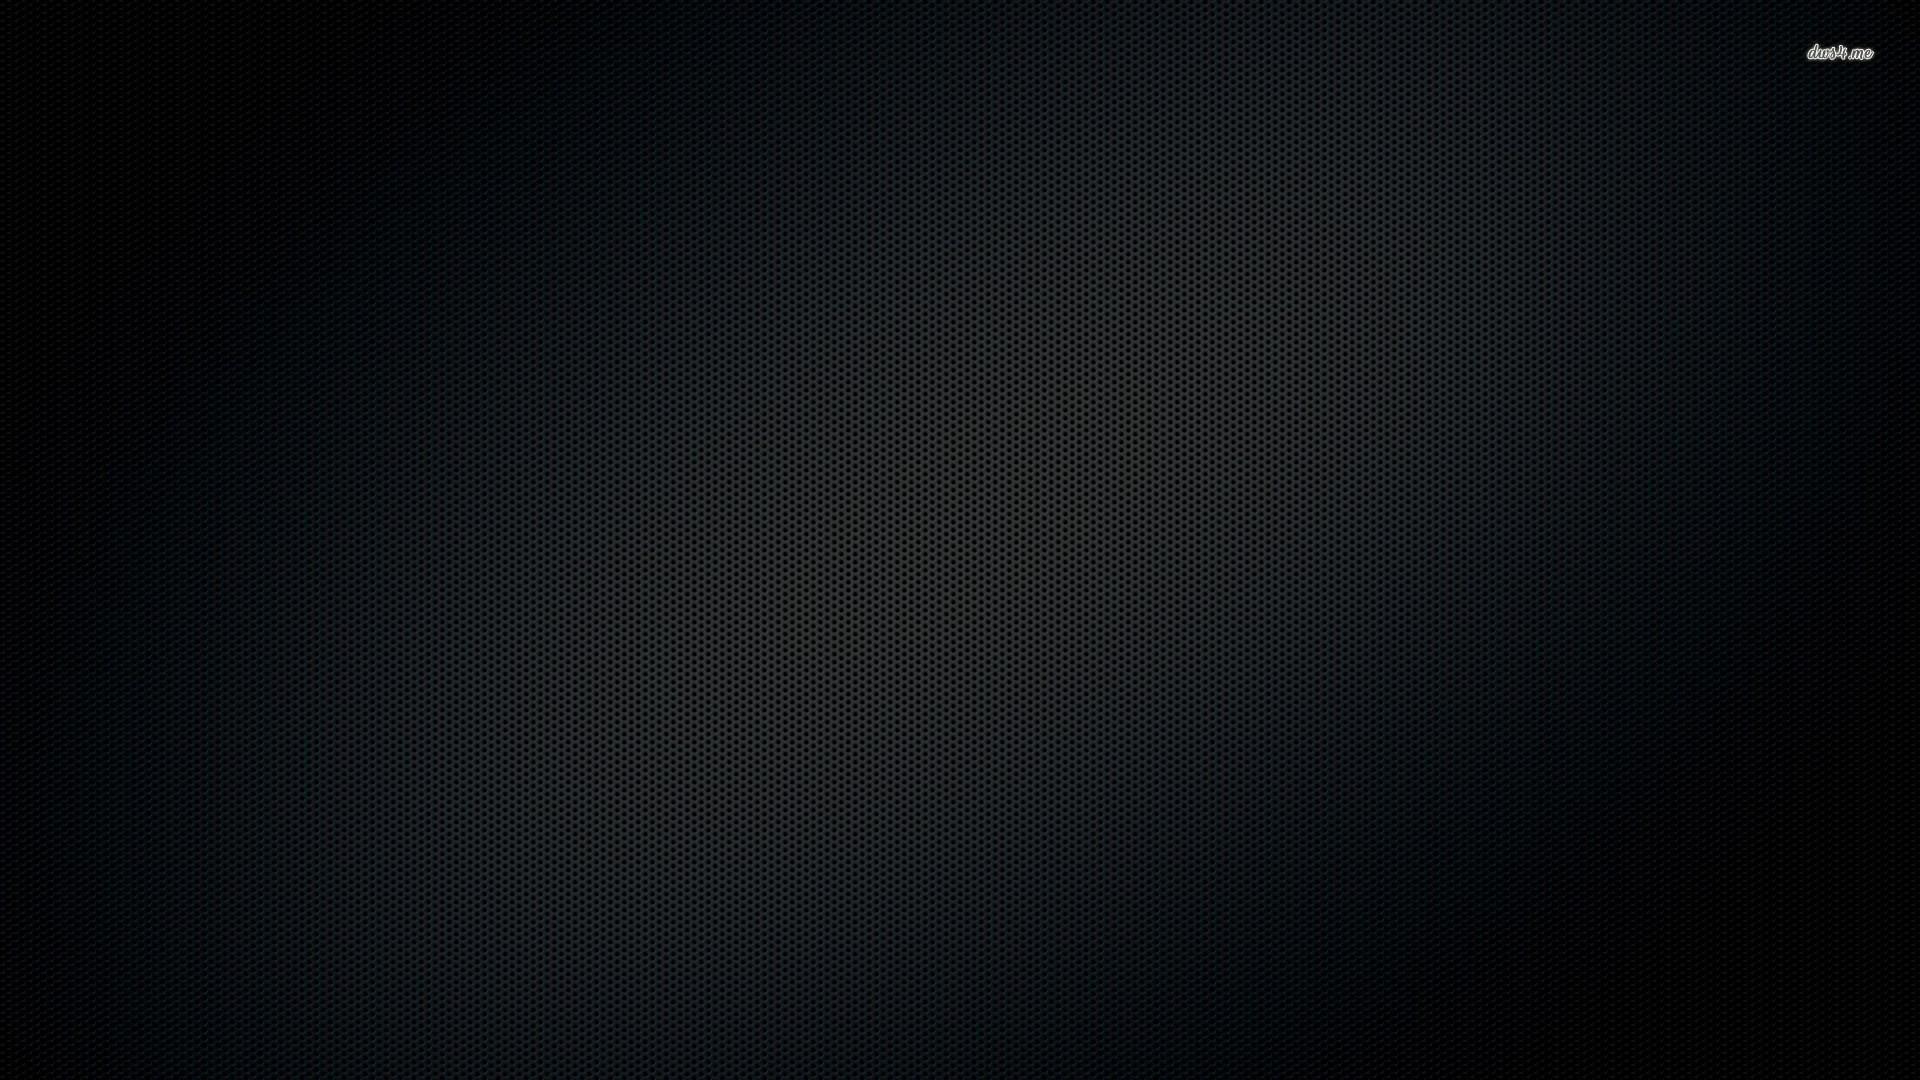 Black Wallpapers High Resolution: High Resolution Desktop Wallpapers 1920x1080 (69+ Images